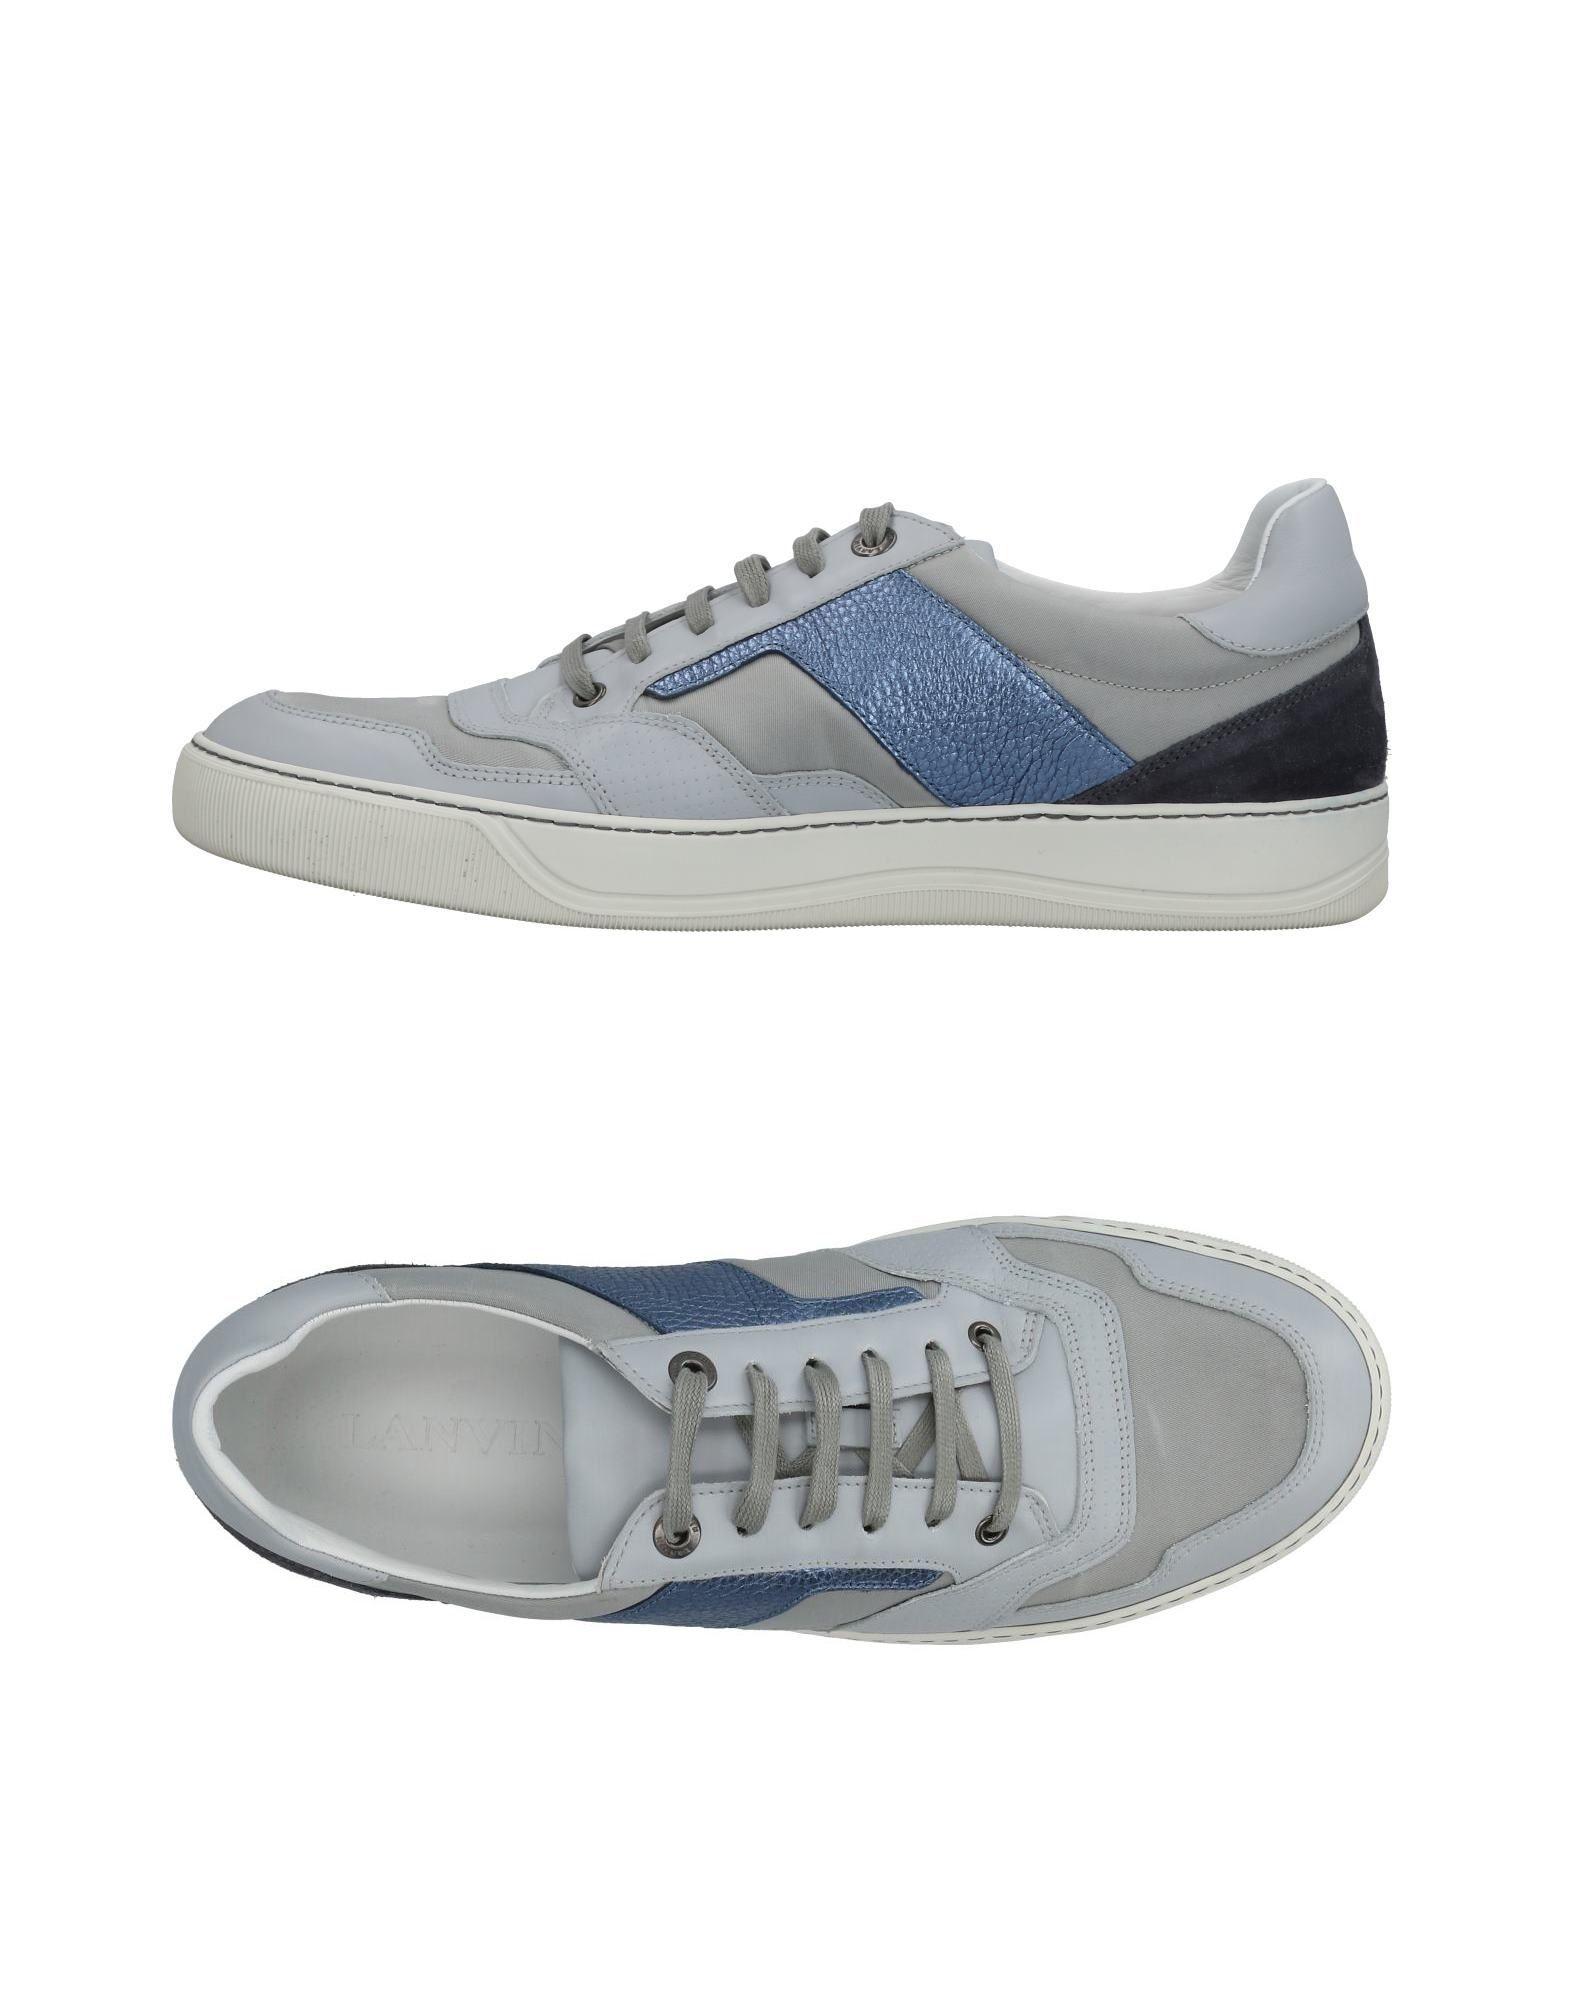 Moda Sneakers Lanvin Uomo - 11461576UB